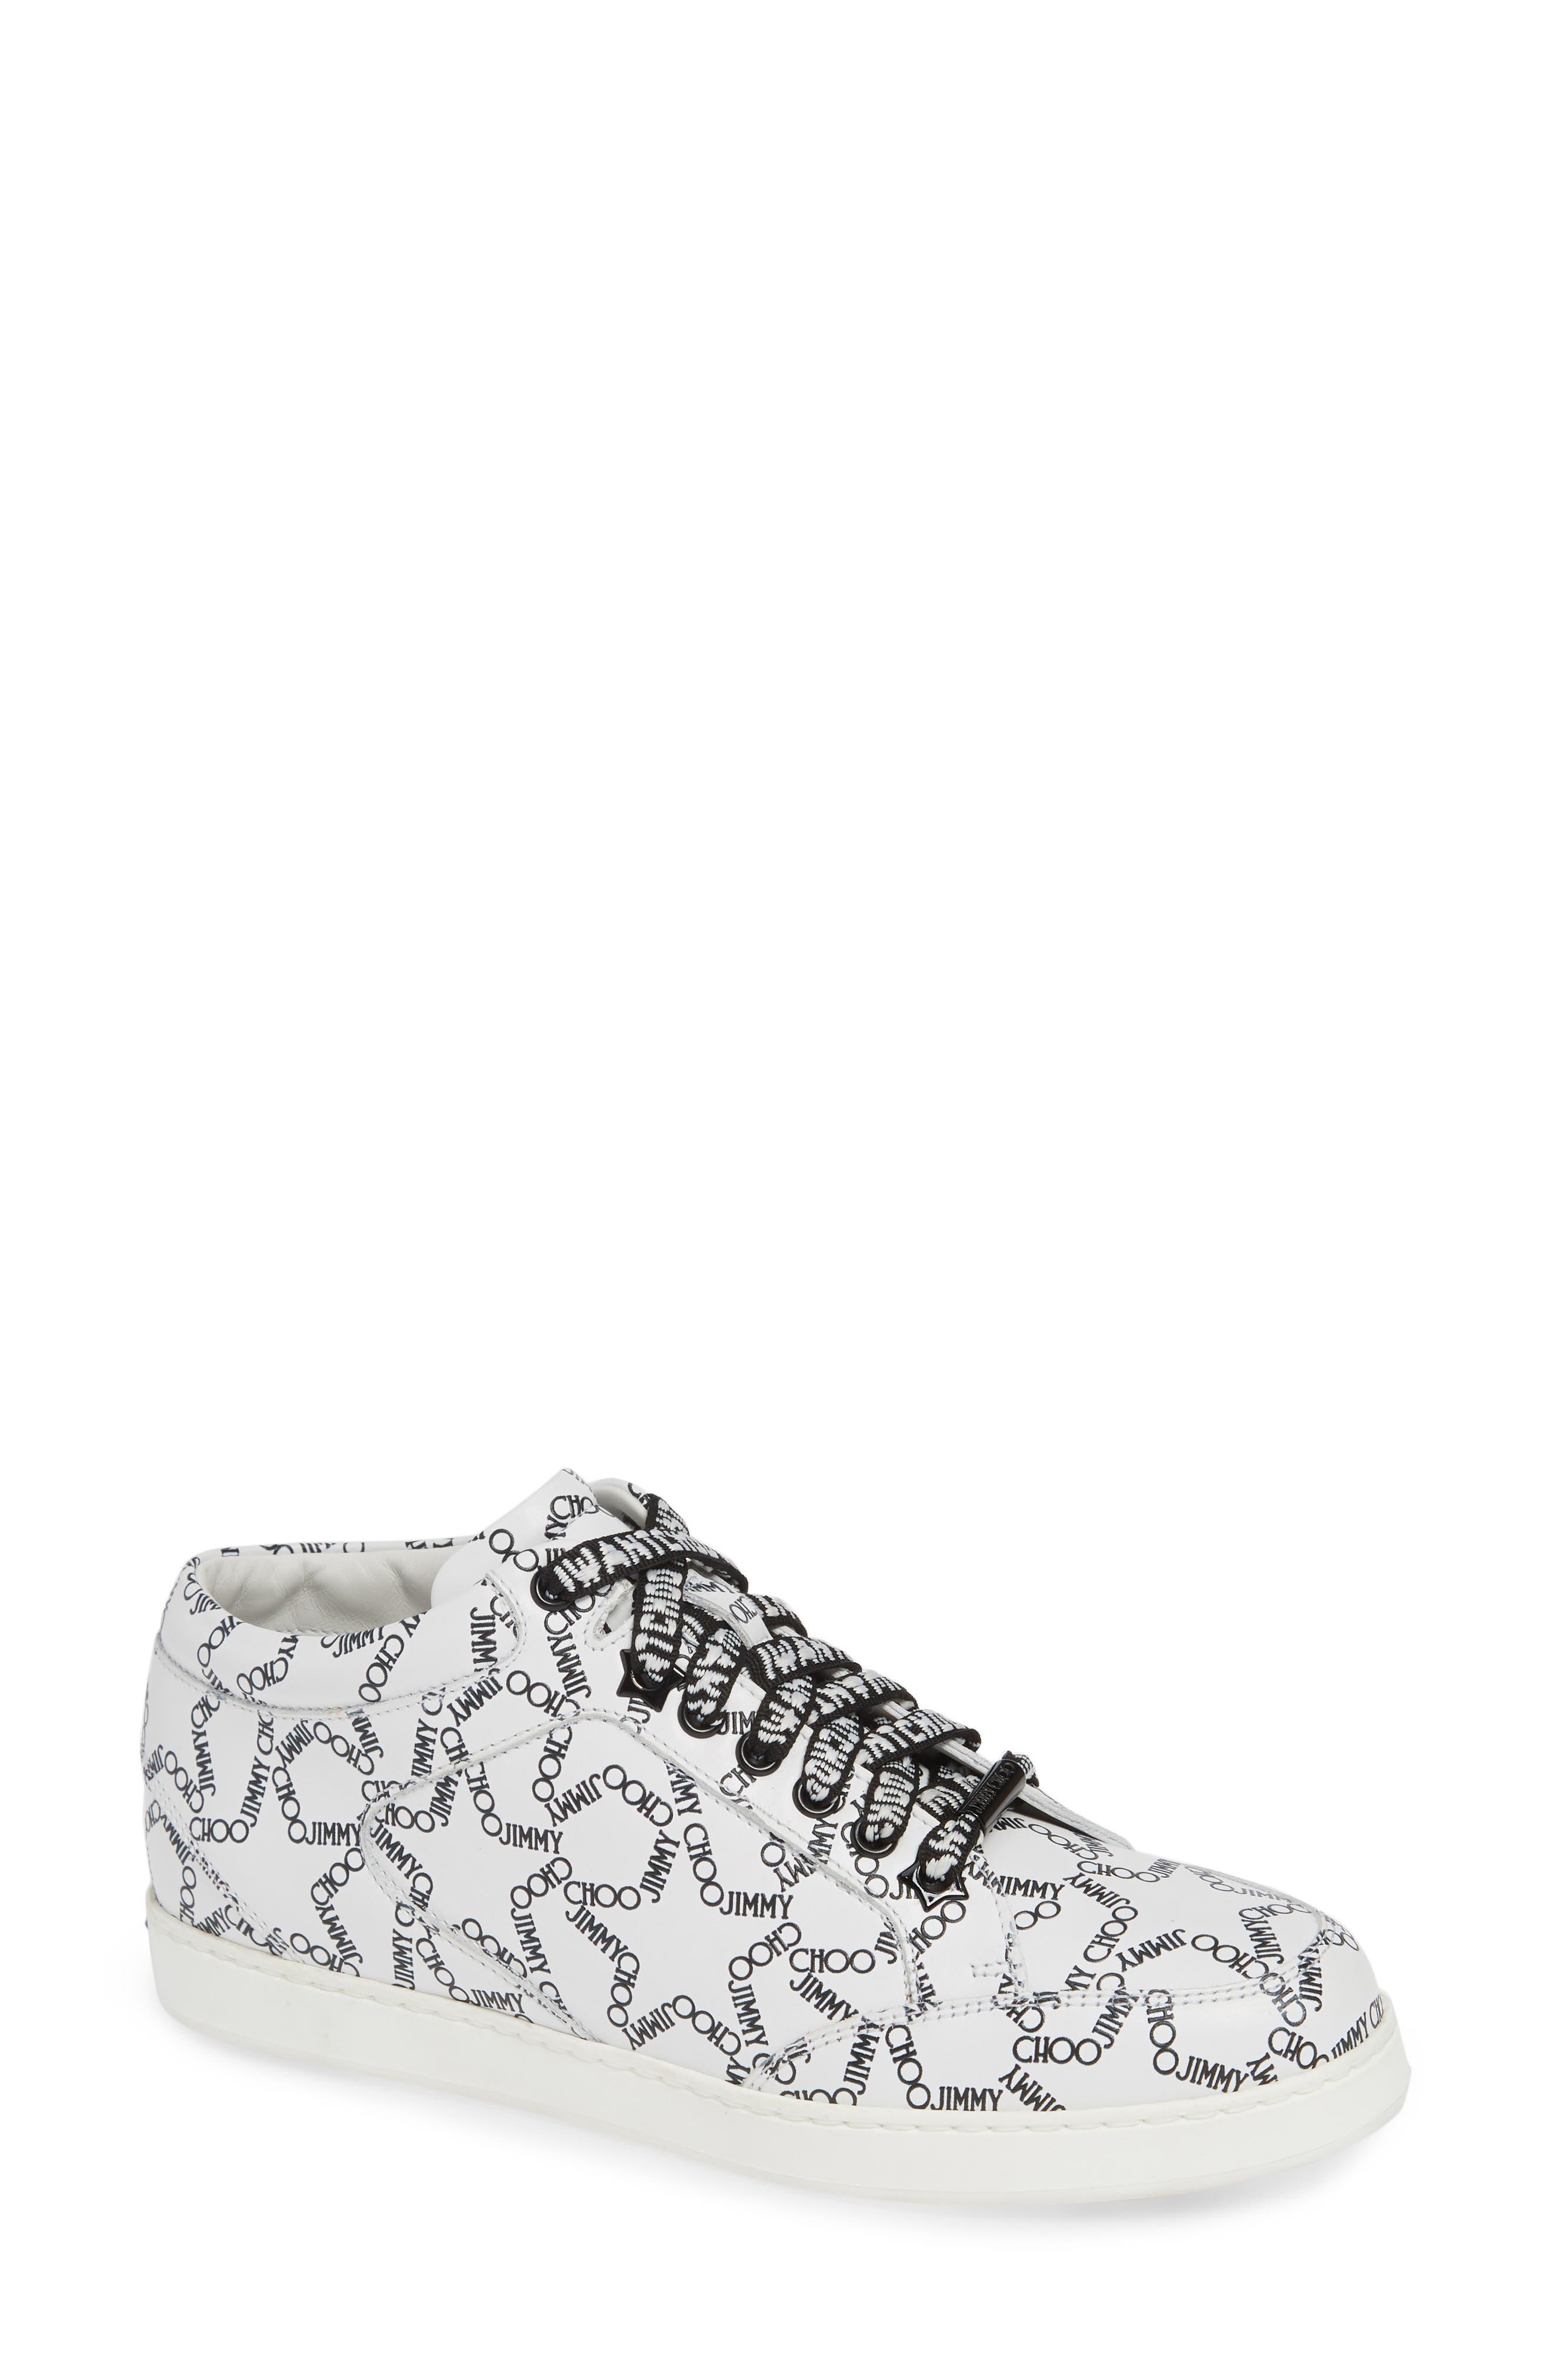 Choo Sneakersamp; Jimmy Running ShoesNordstrom Women's WCxerBod